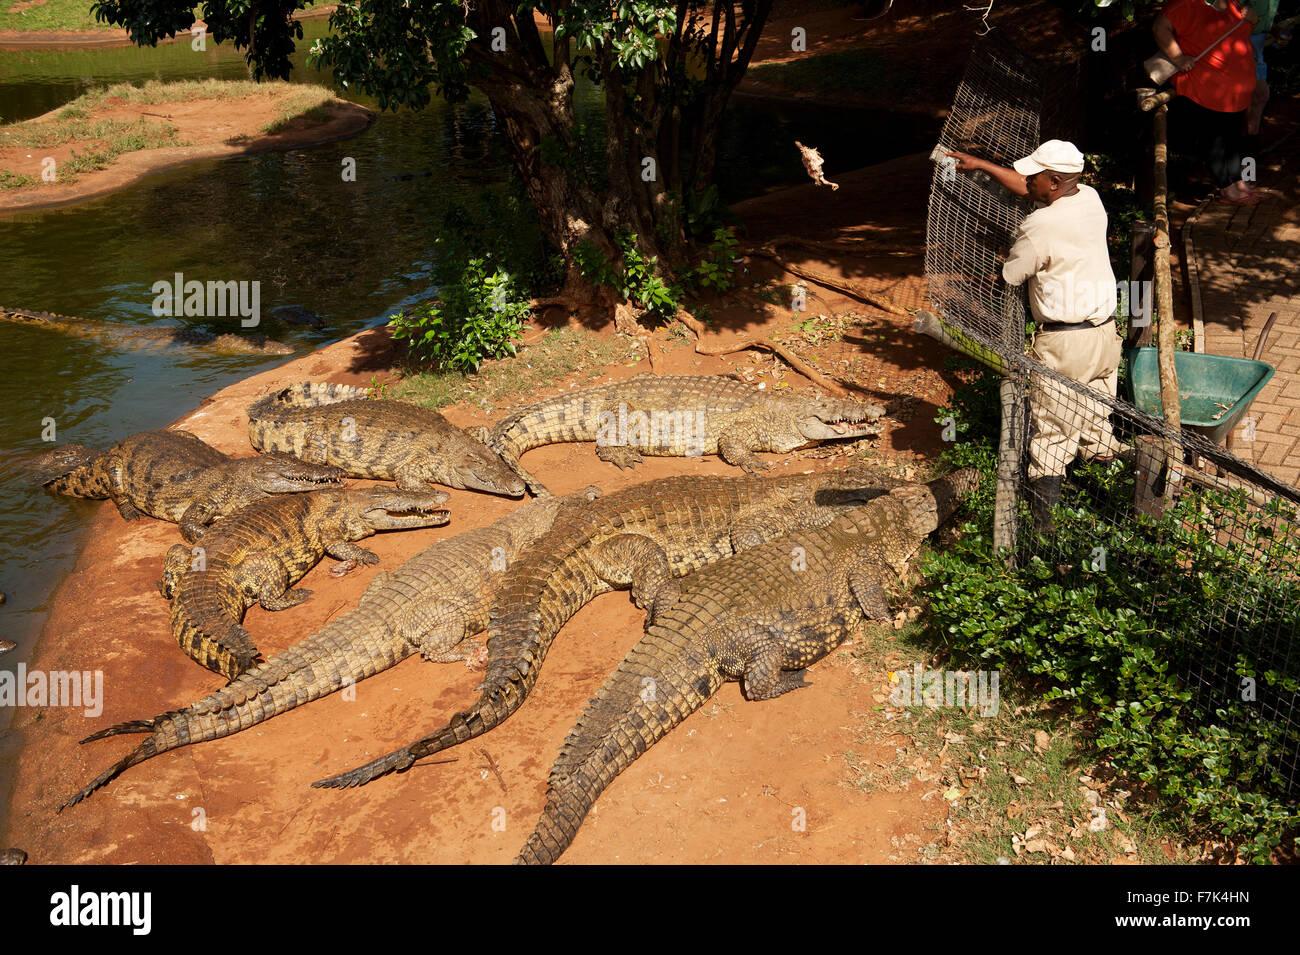 Nile crocodiles are fed chickens at the Crocworld crocodile farm  at Scottburgh,  KwaZulu Natal, South Africa - Stock Image